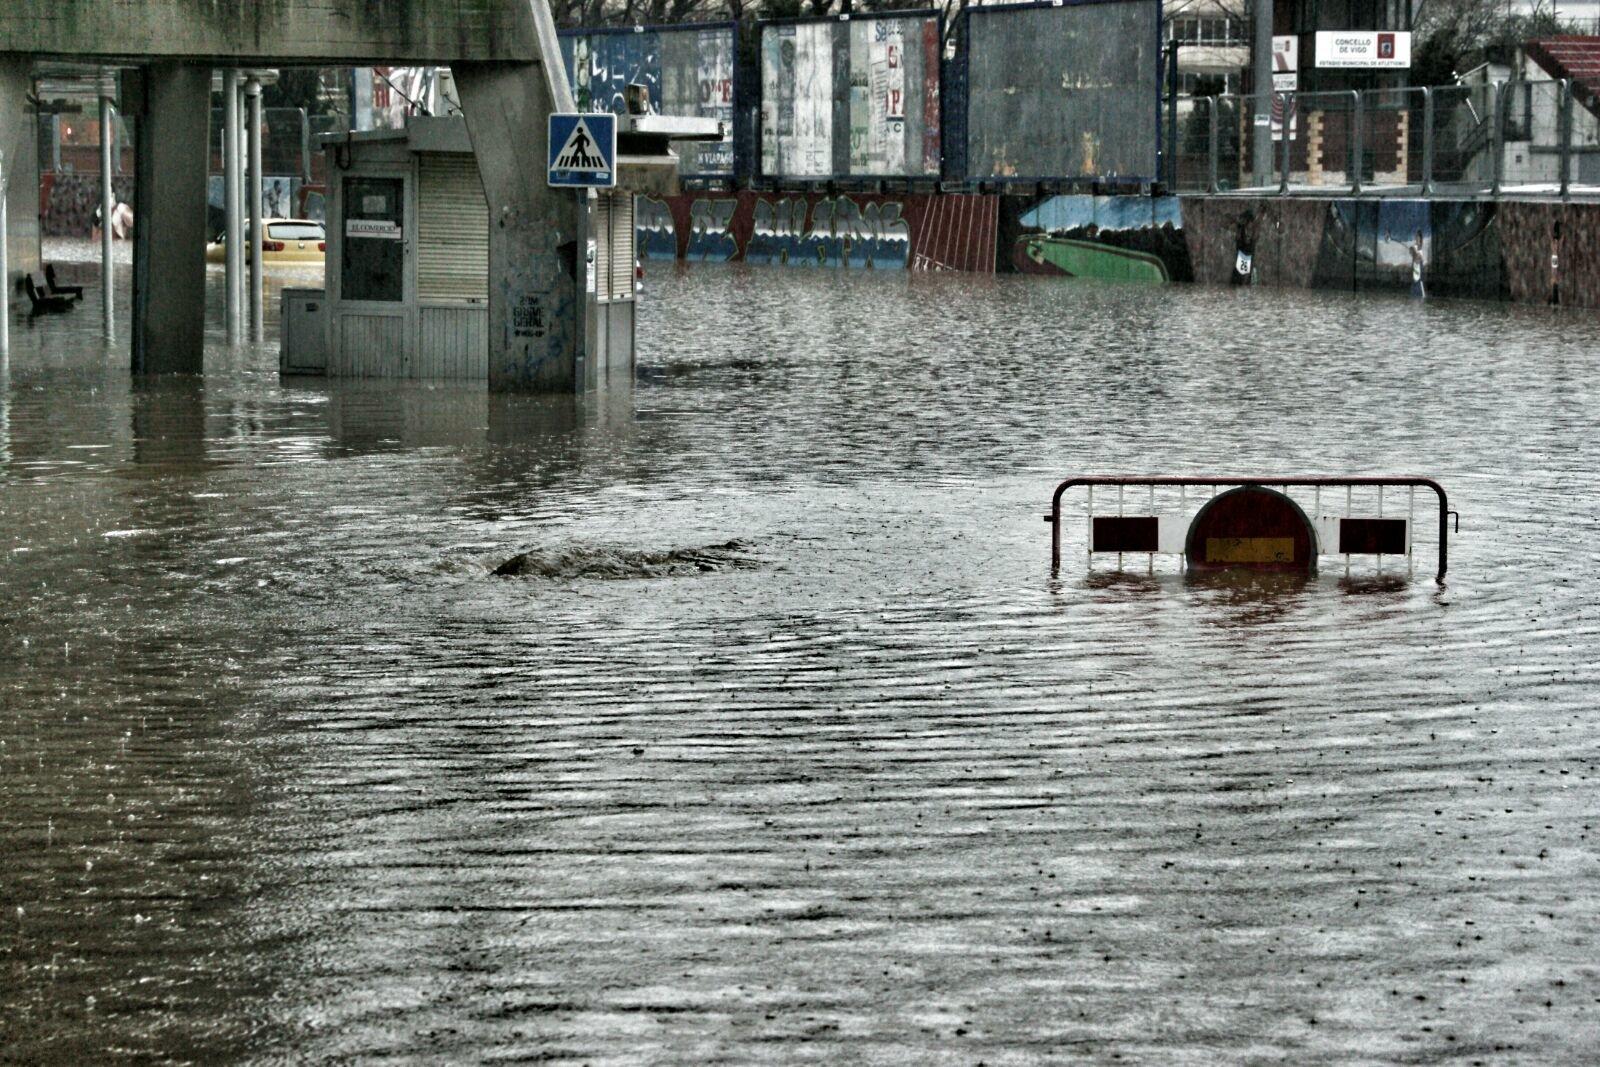 La zona de Balaidos inundada // Vicente Alonso